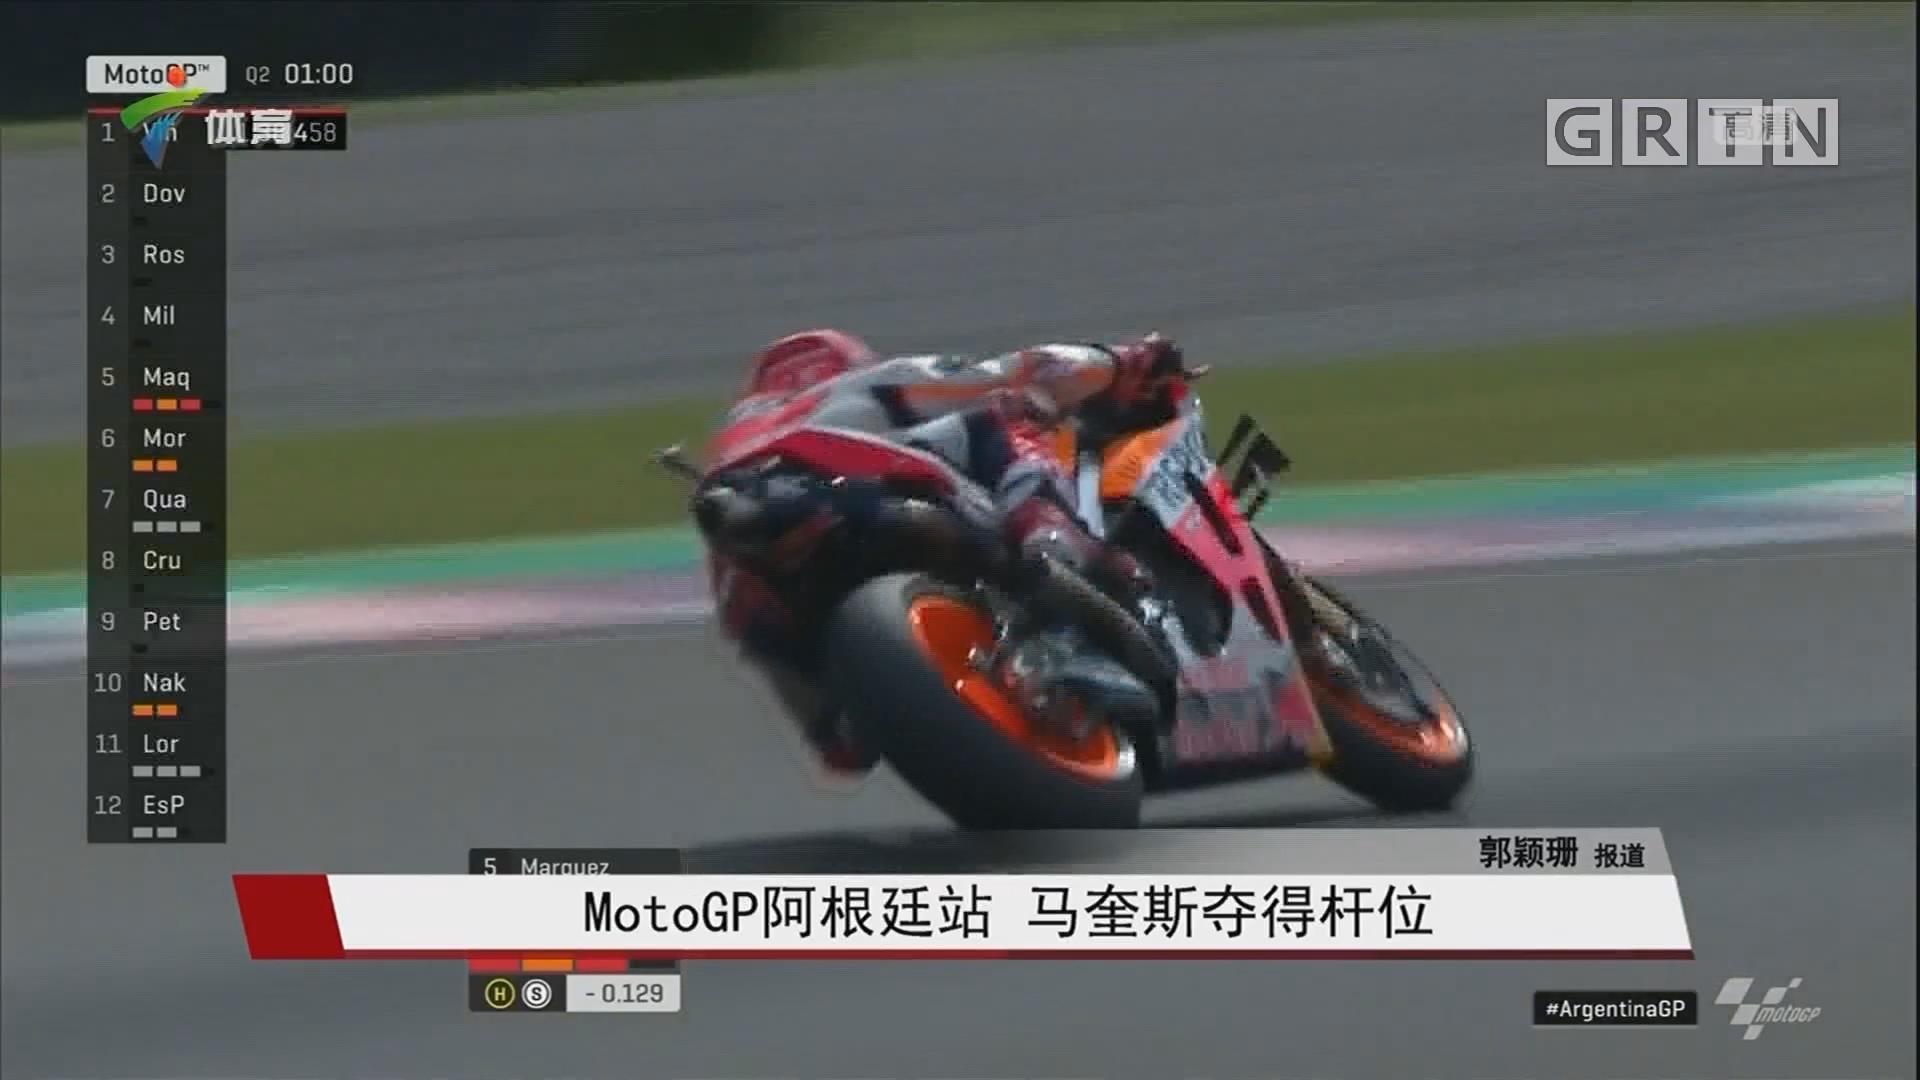 MotoGP阿根廷站 马奎斯夺得杆位